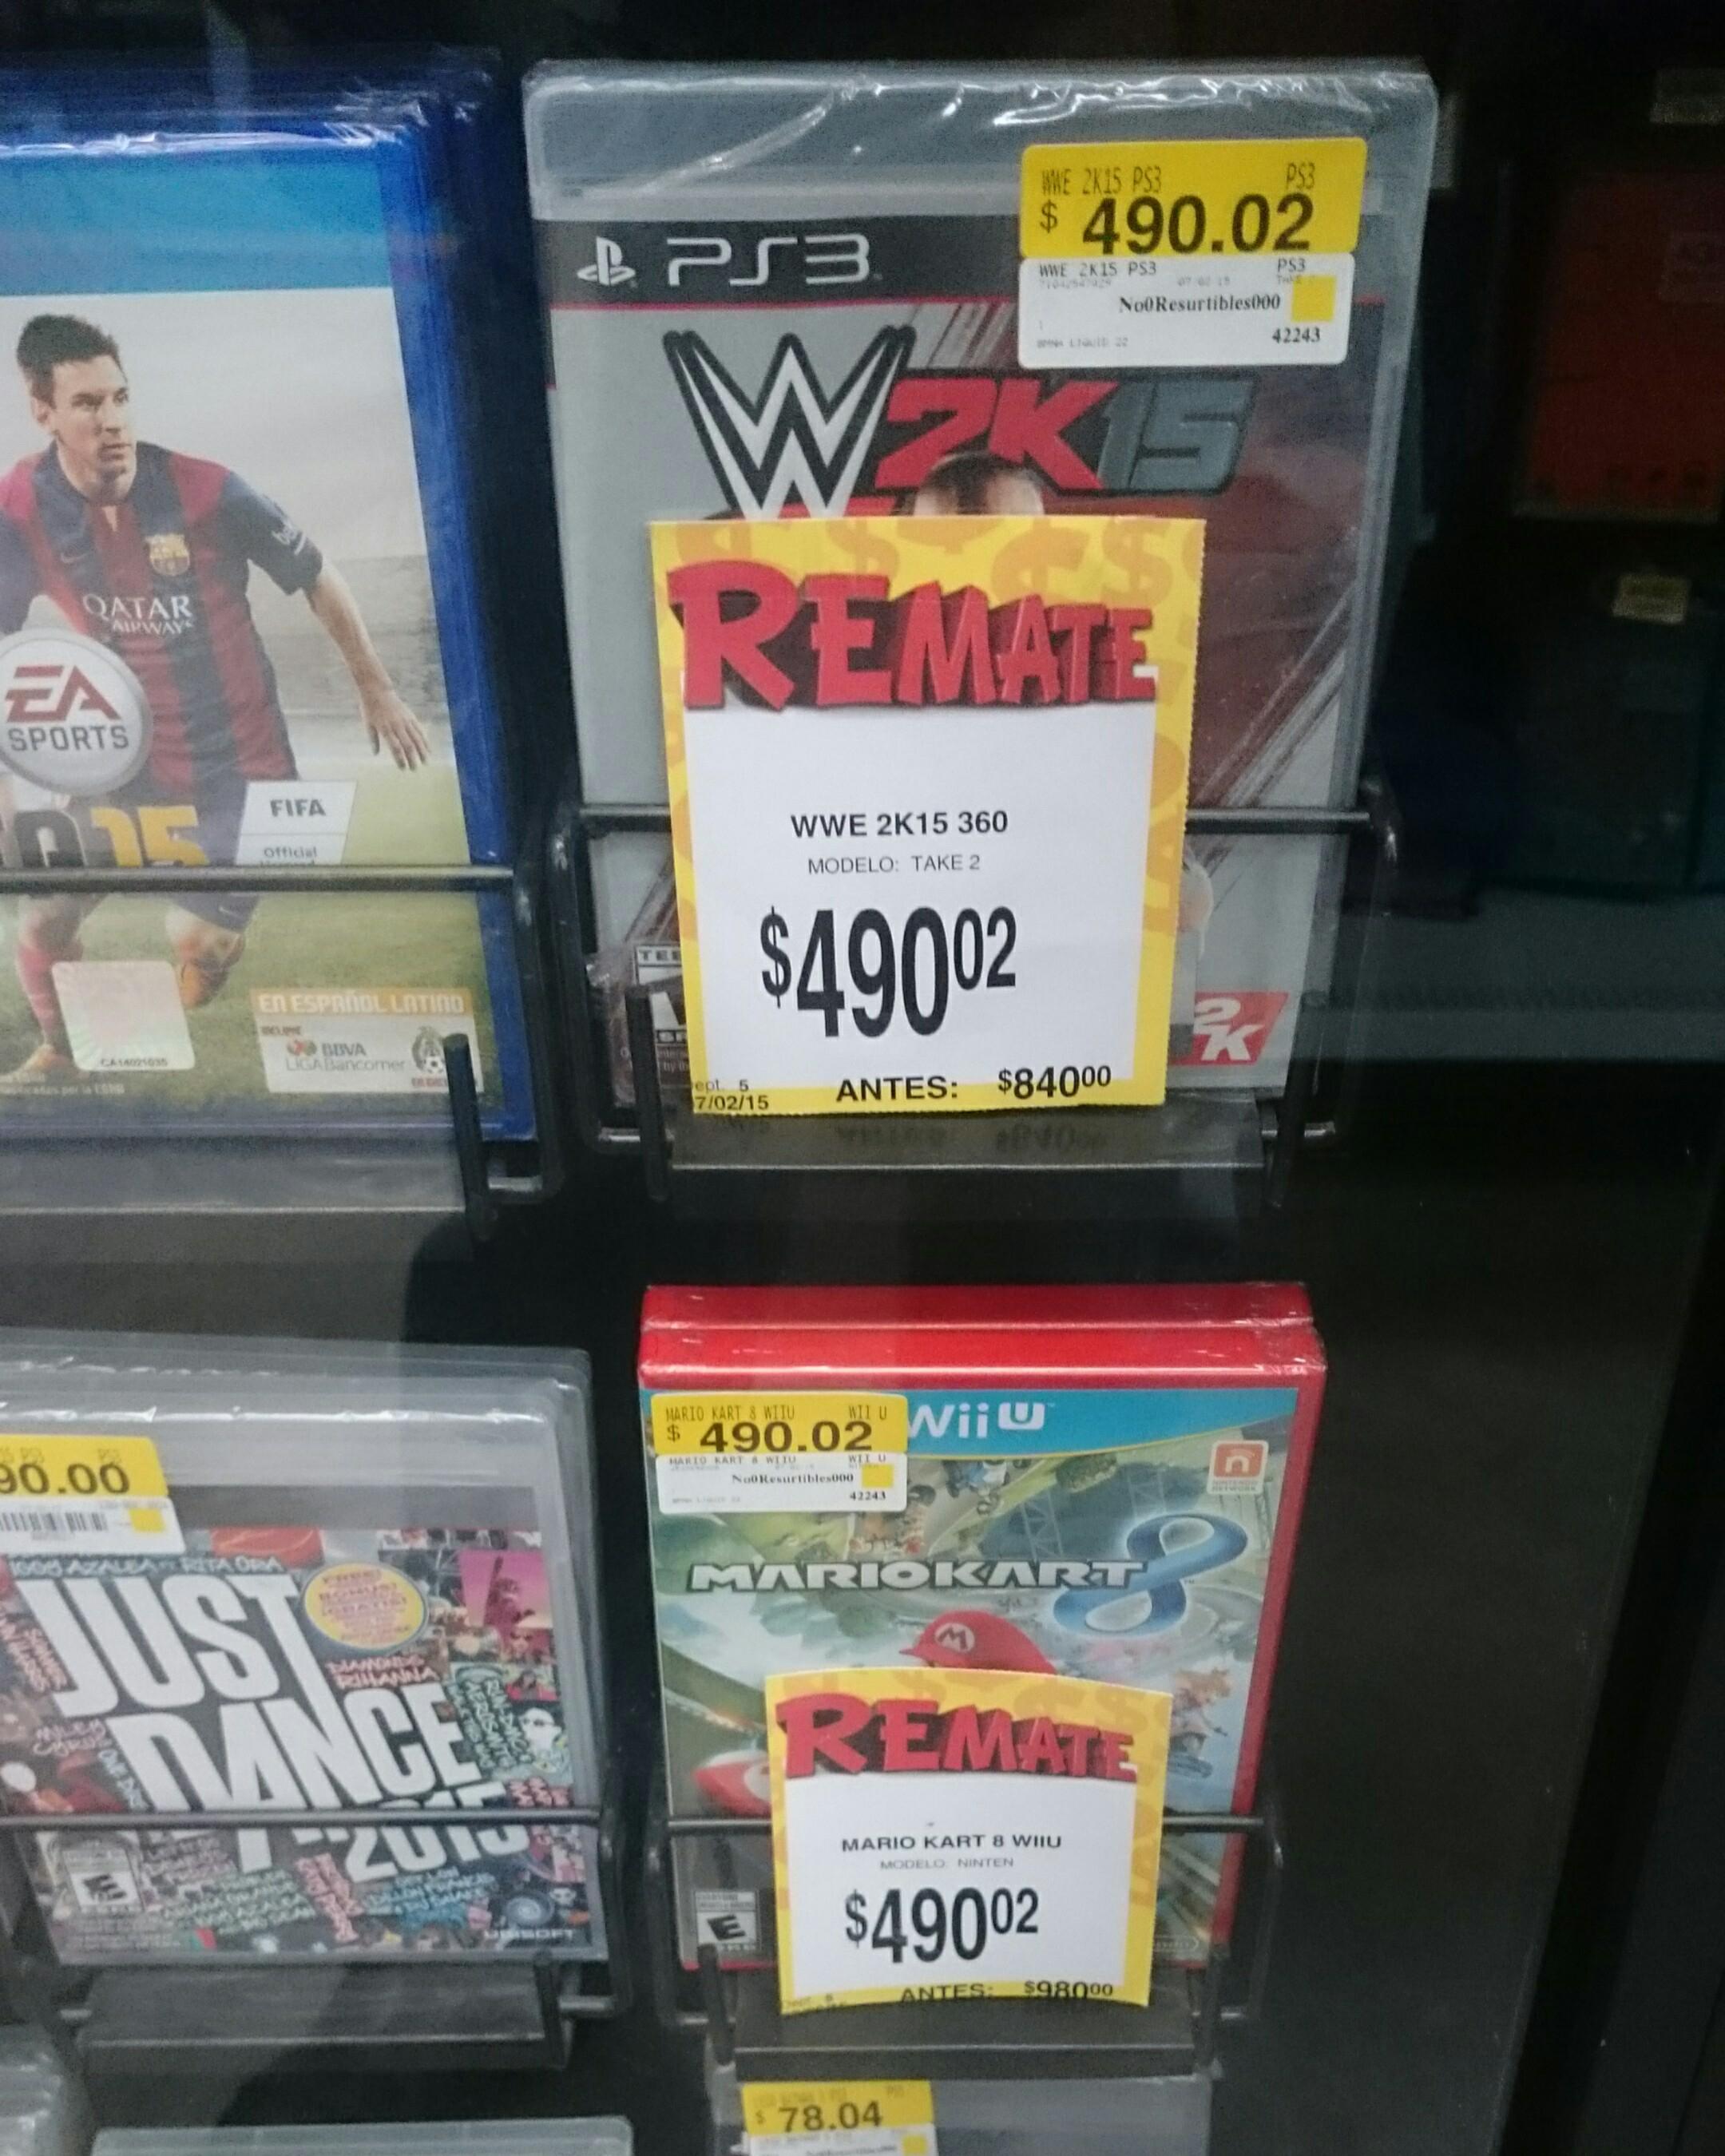 Bodega Aurrerá: Mario Kart 8 para Wii U o WWE 2K2015 para PS3 en $490.02